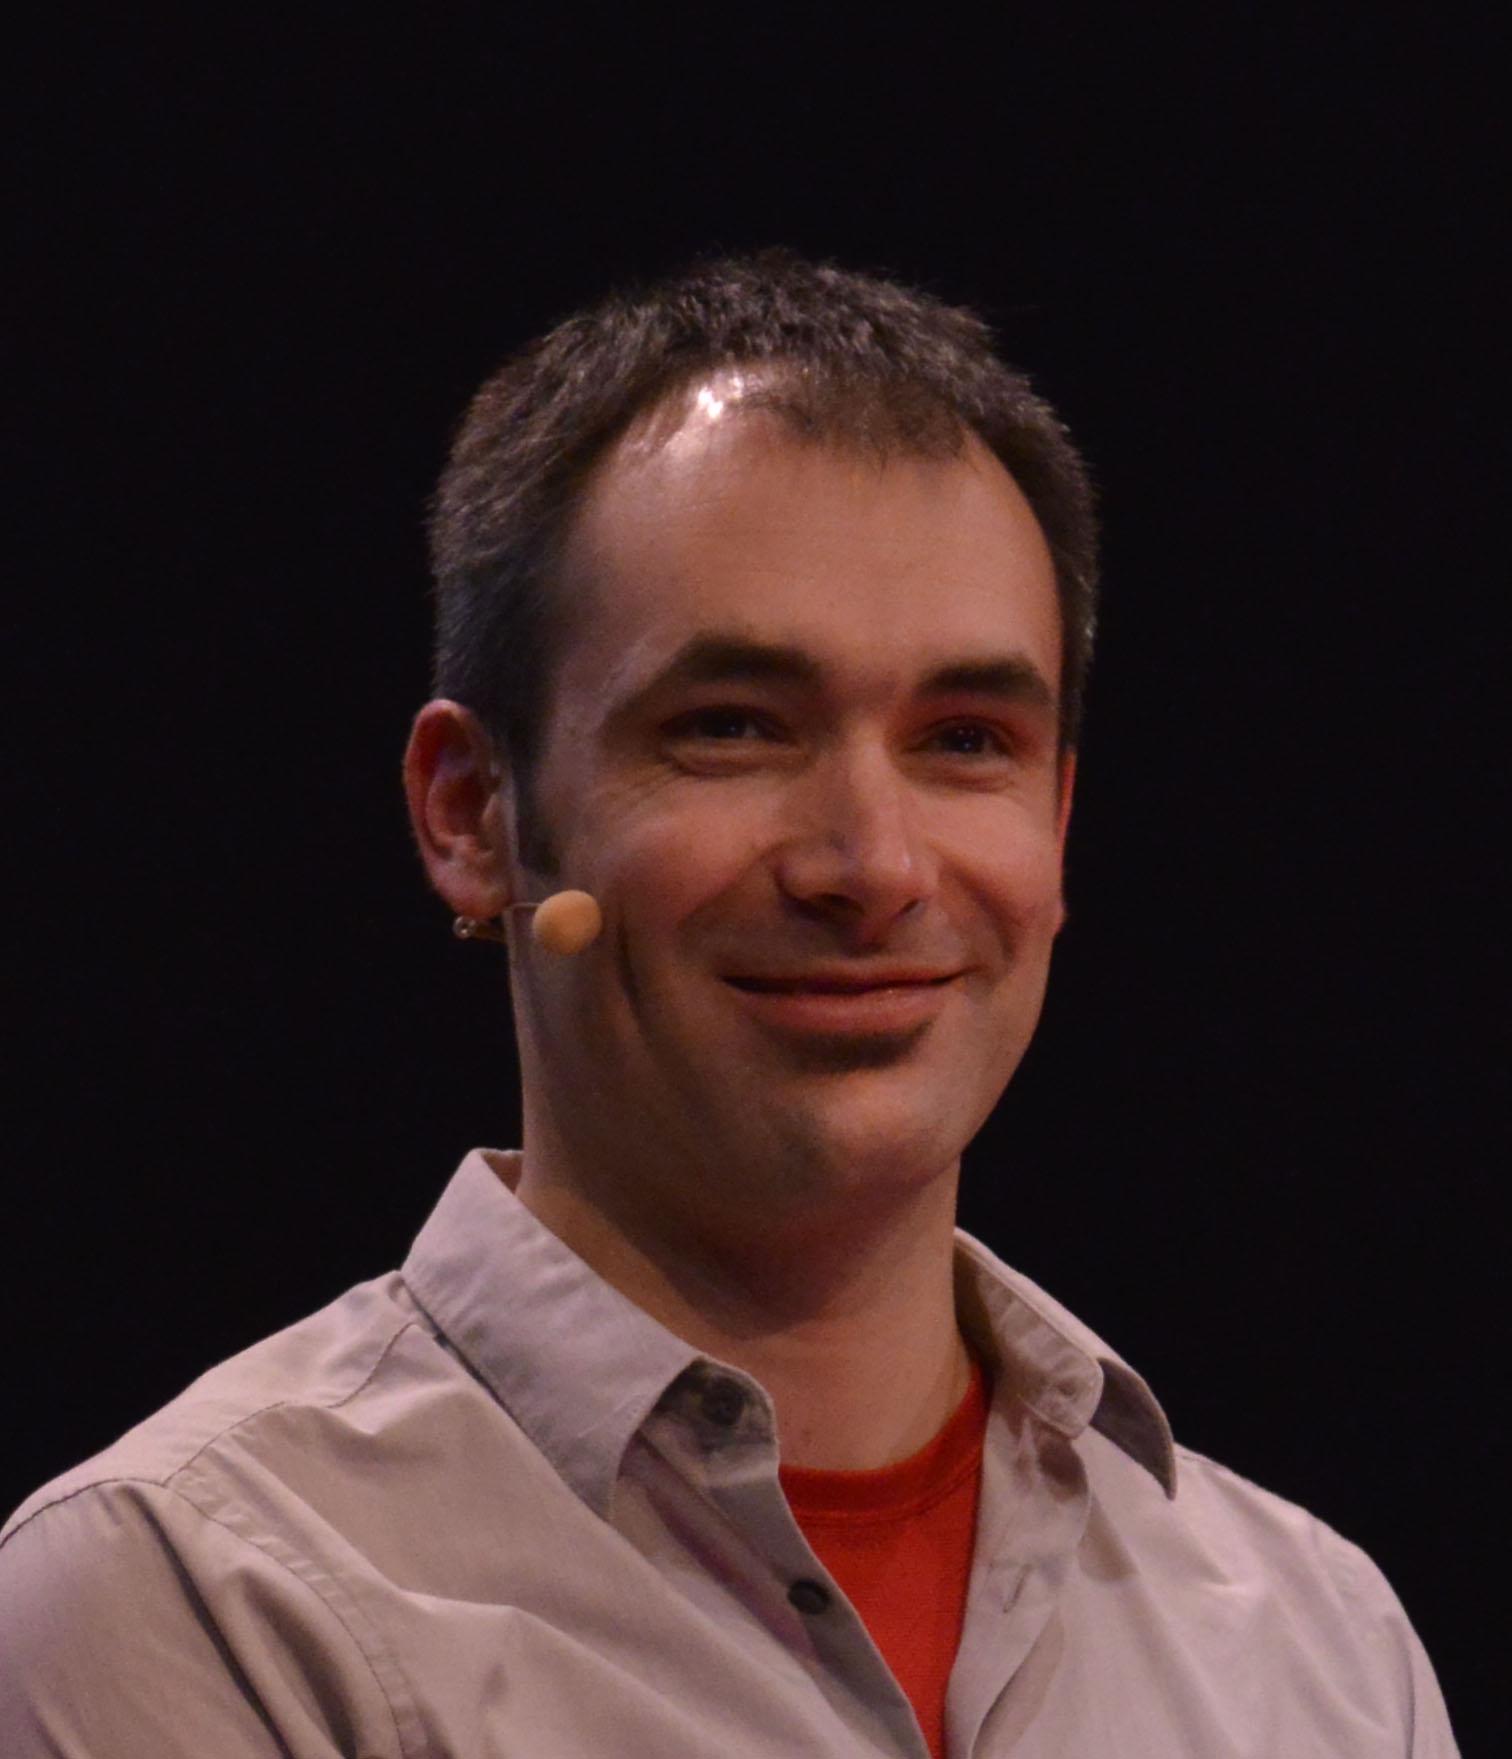 Dr Samuel Lagier, from SamSpeaksScience